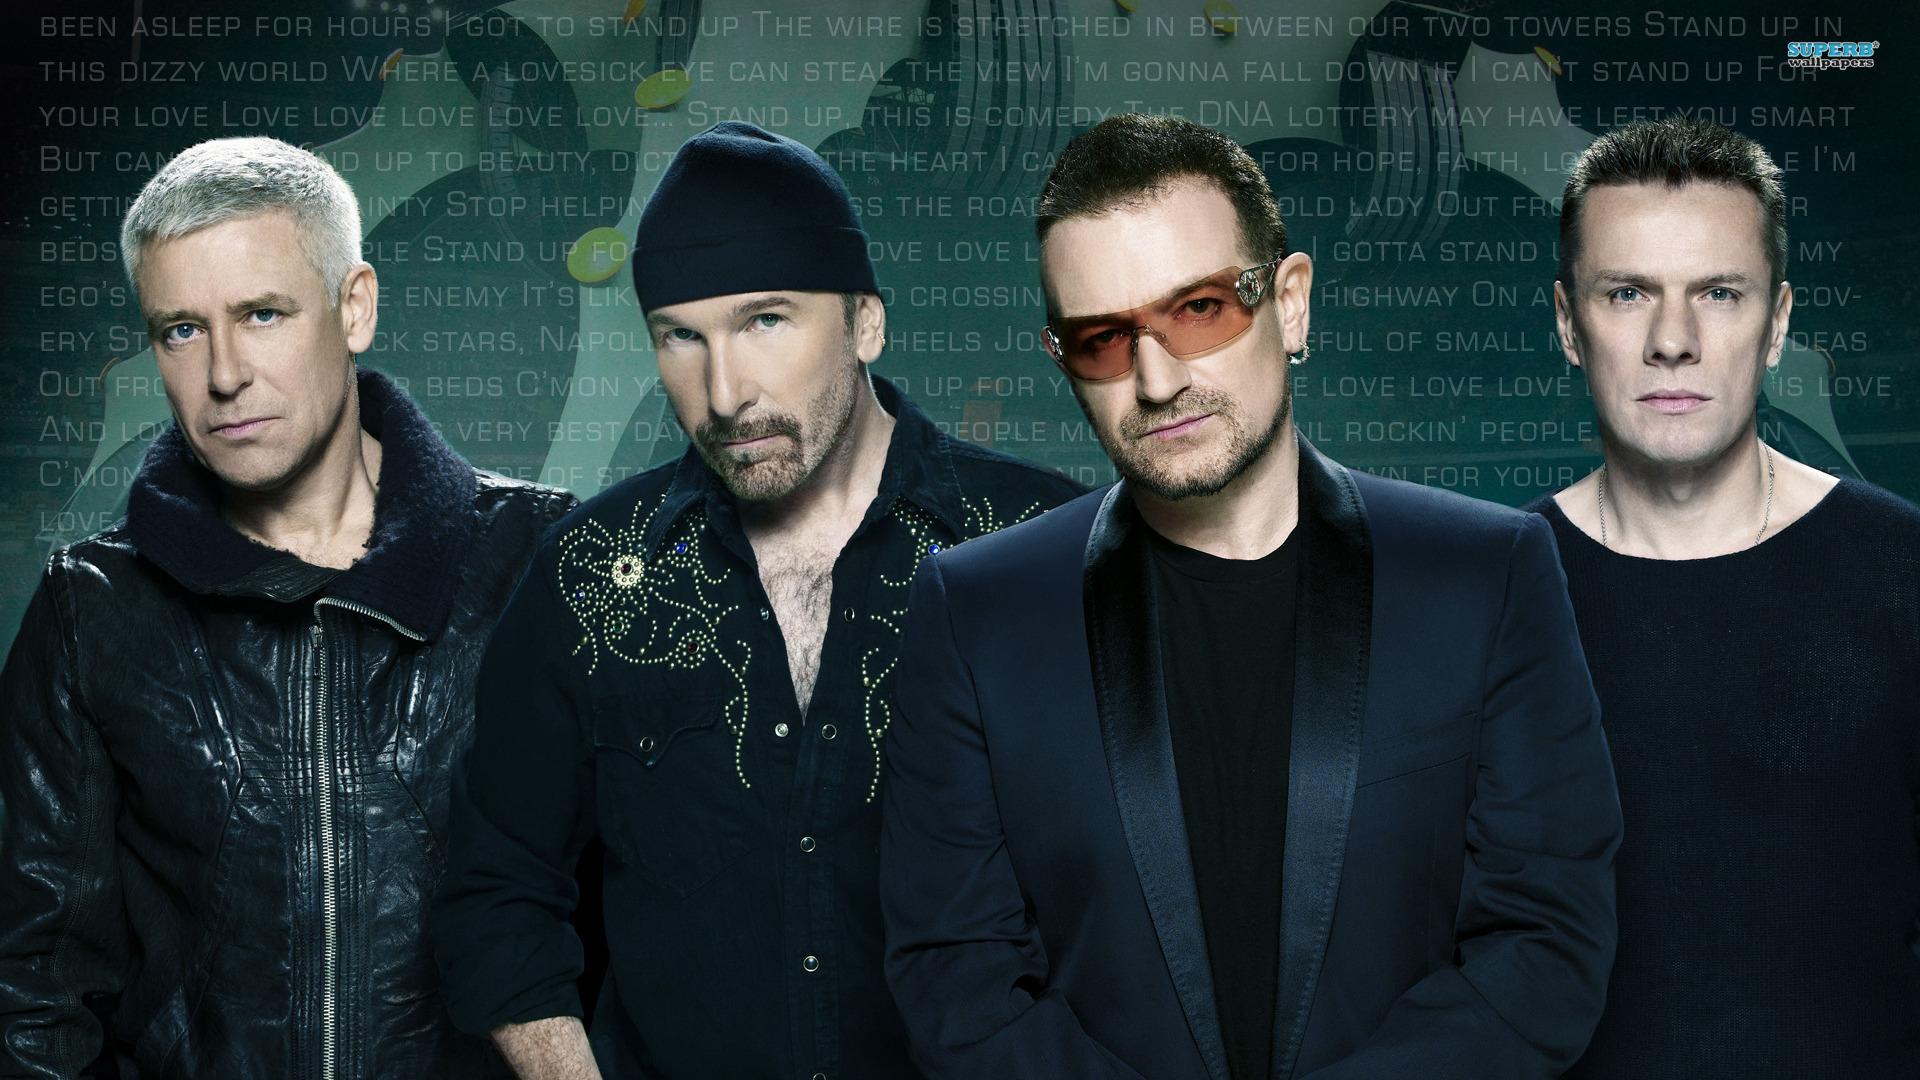 La Banda Rock U2 - 1920x1080